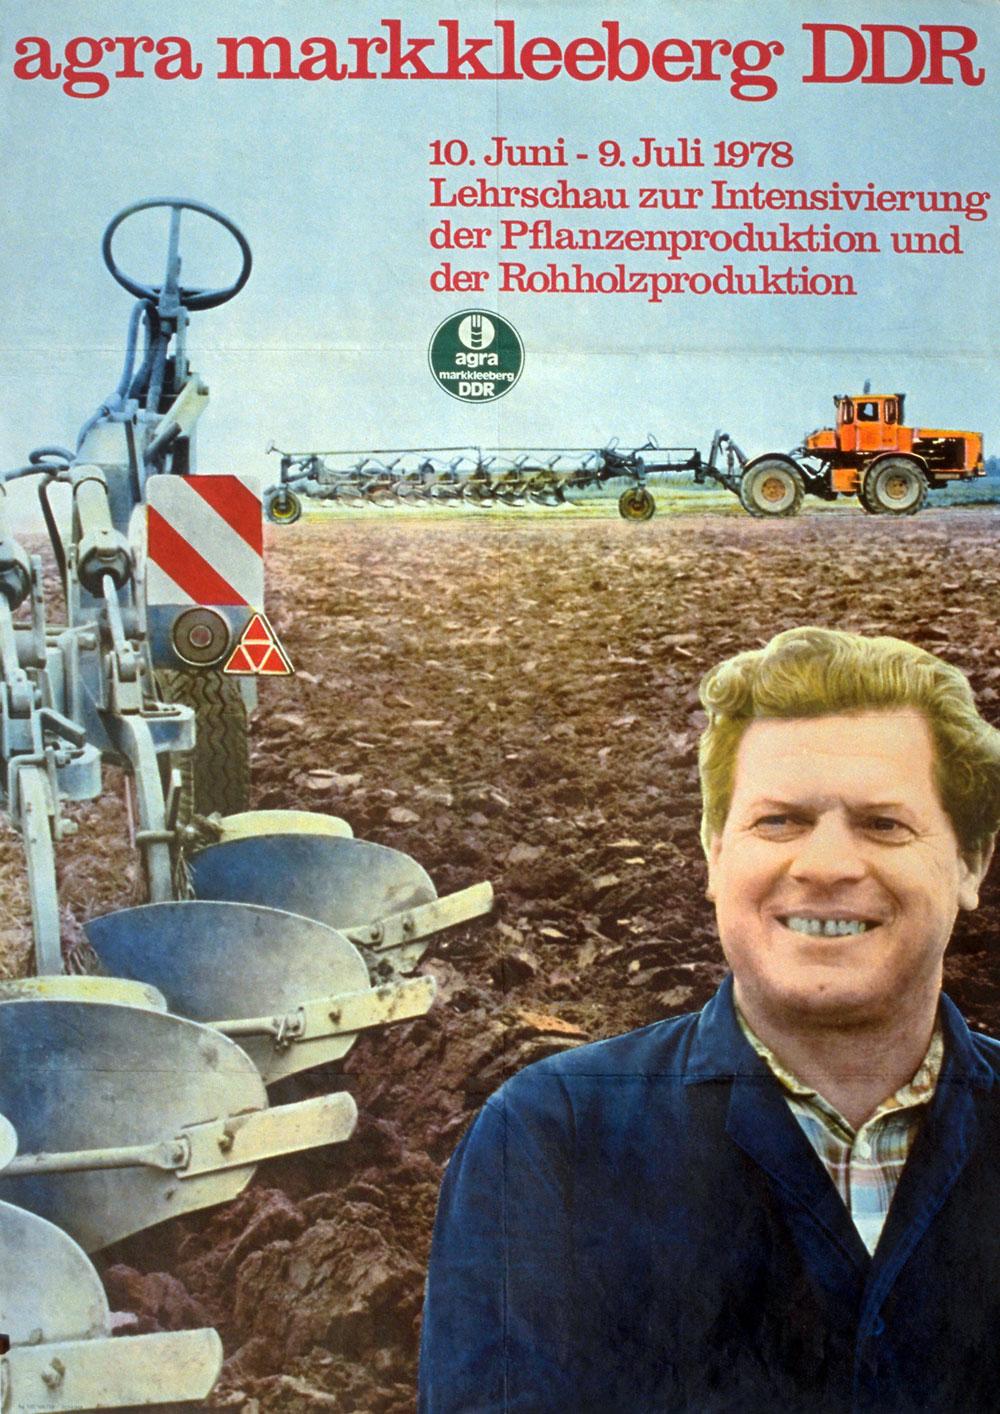 Agrar-Plakat der DDR